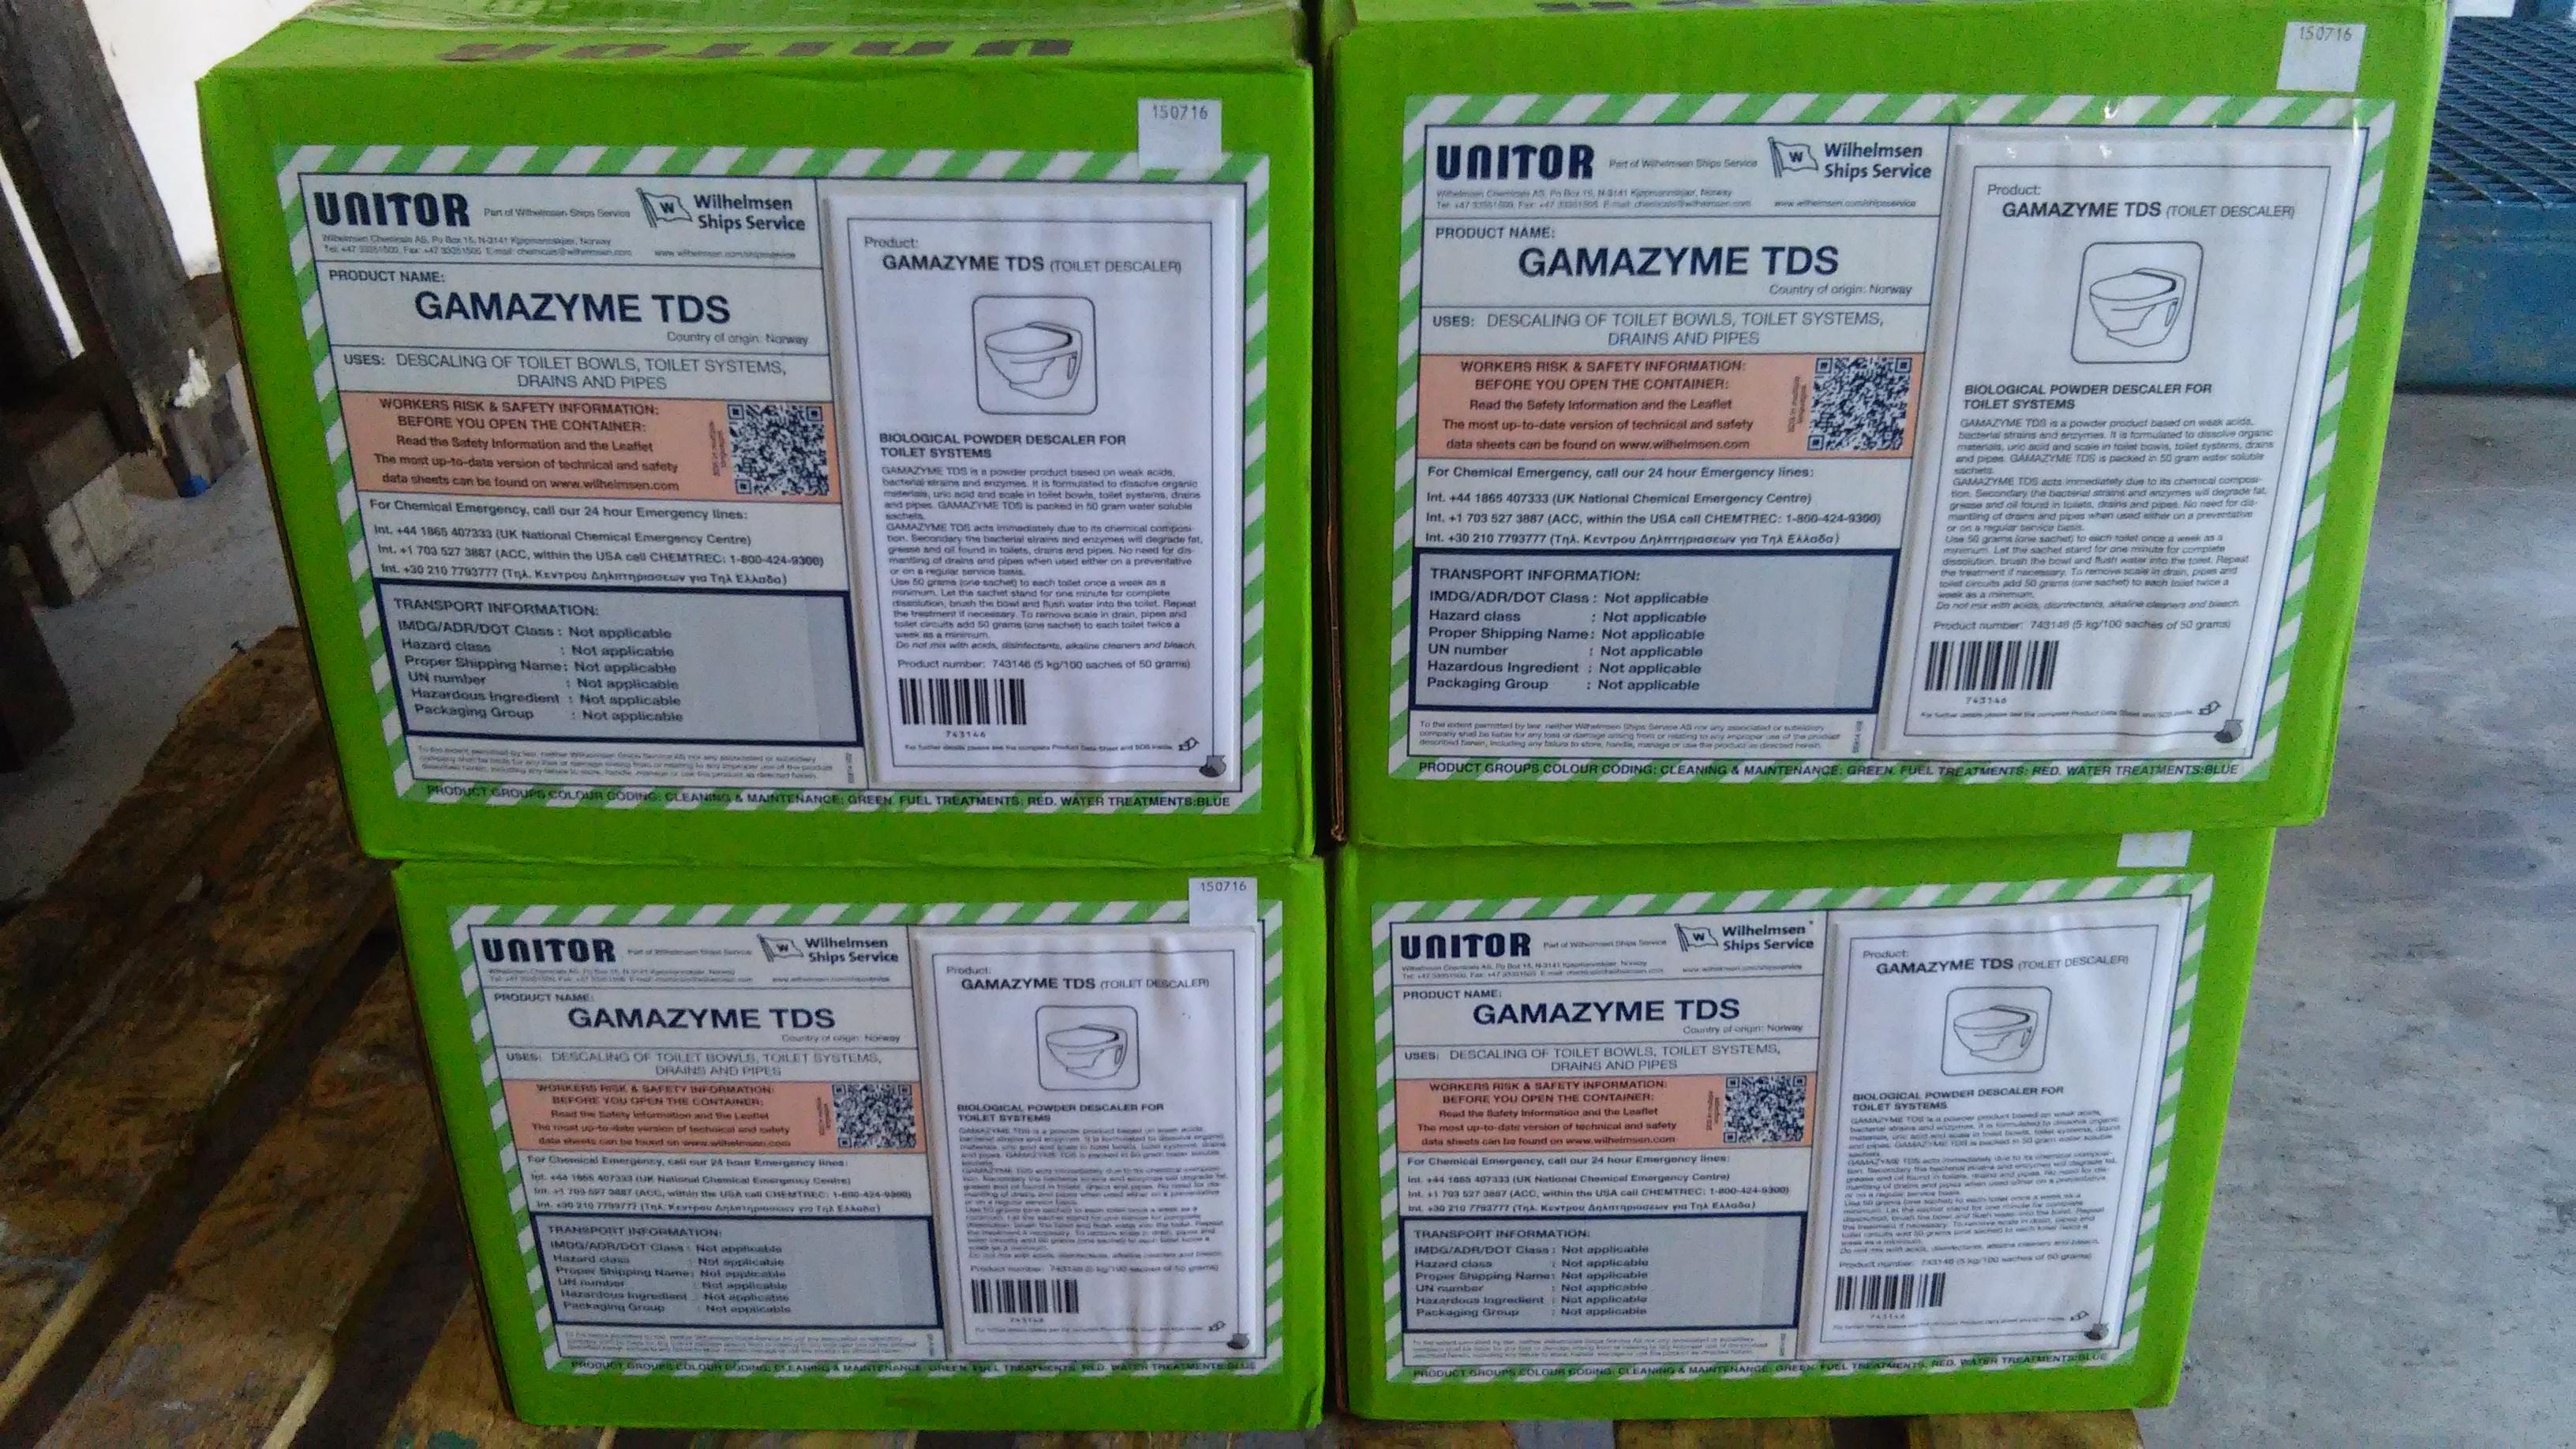 GAMAZYME TOILET DESCALER, 5 KGS/CARTON. P/N: 653 743146. MAKER: UNITOR